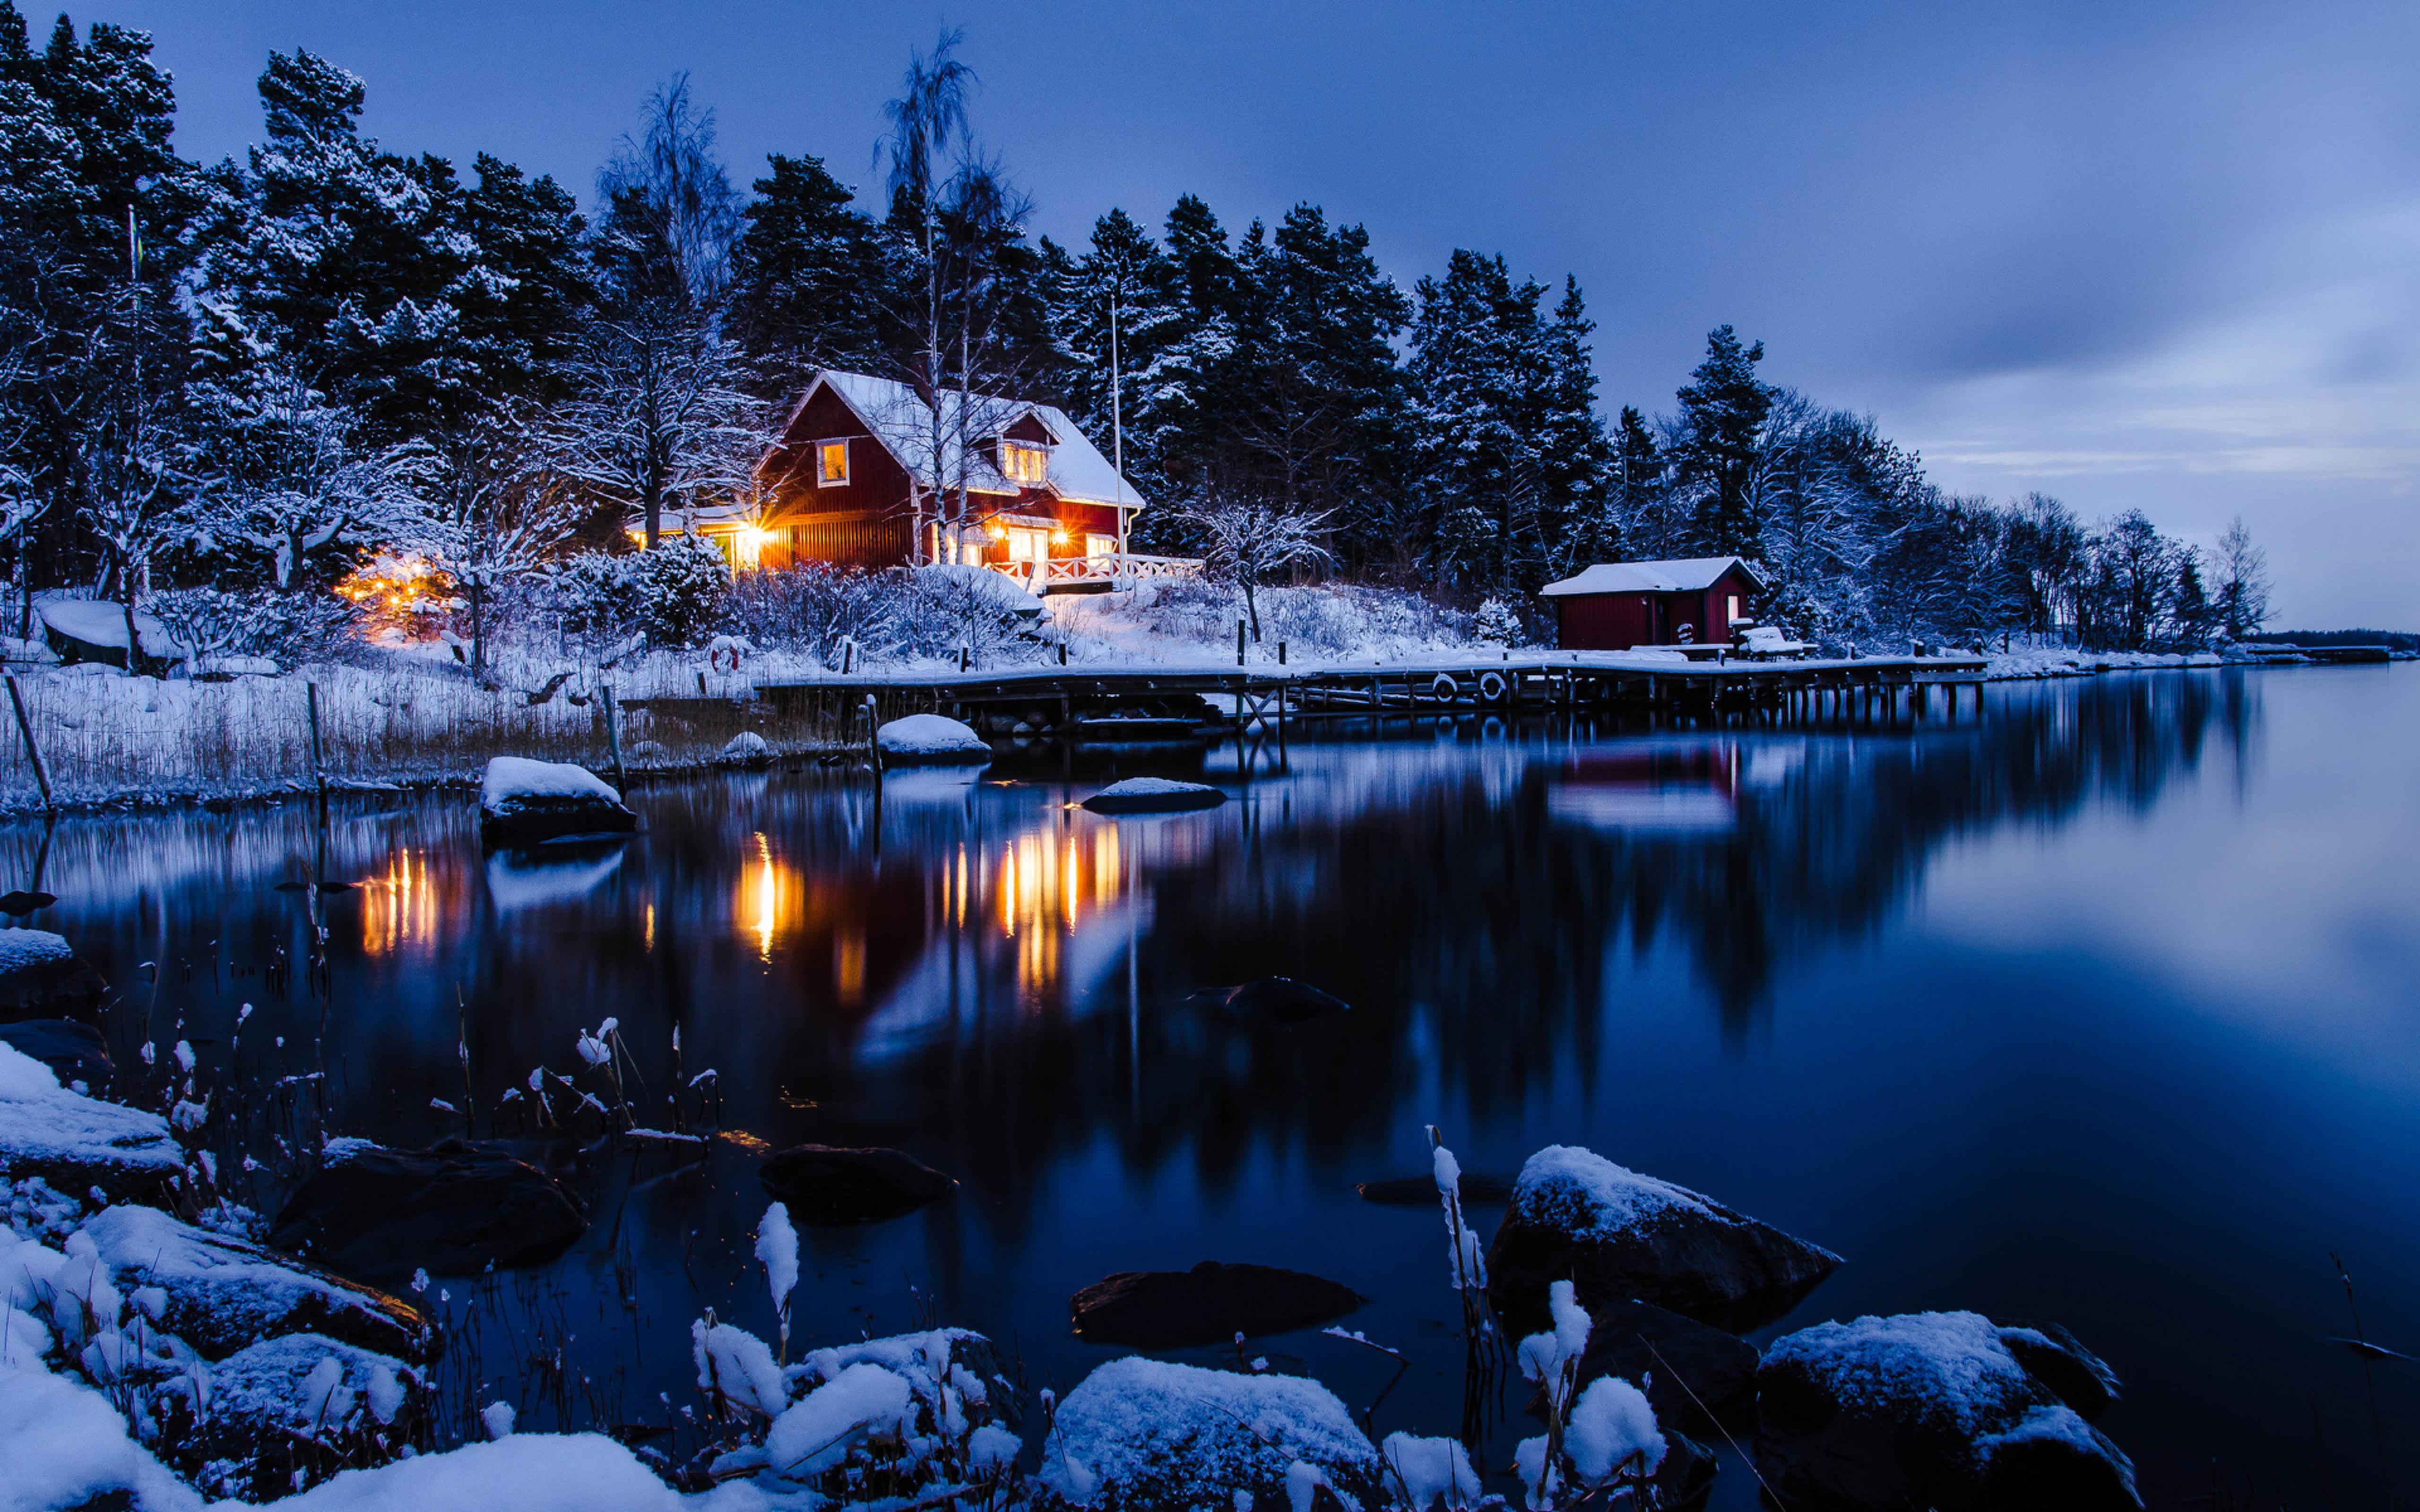 Haus am see wallpaper  Lake House in Winter 5k Retina Ultra HD Wallpaper and Hintergrund ...